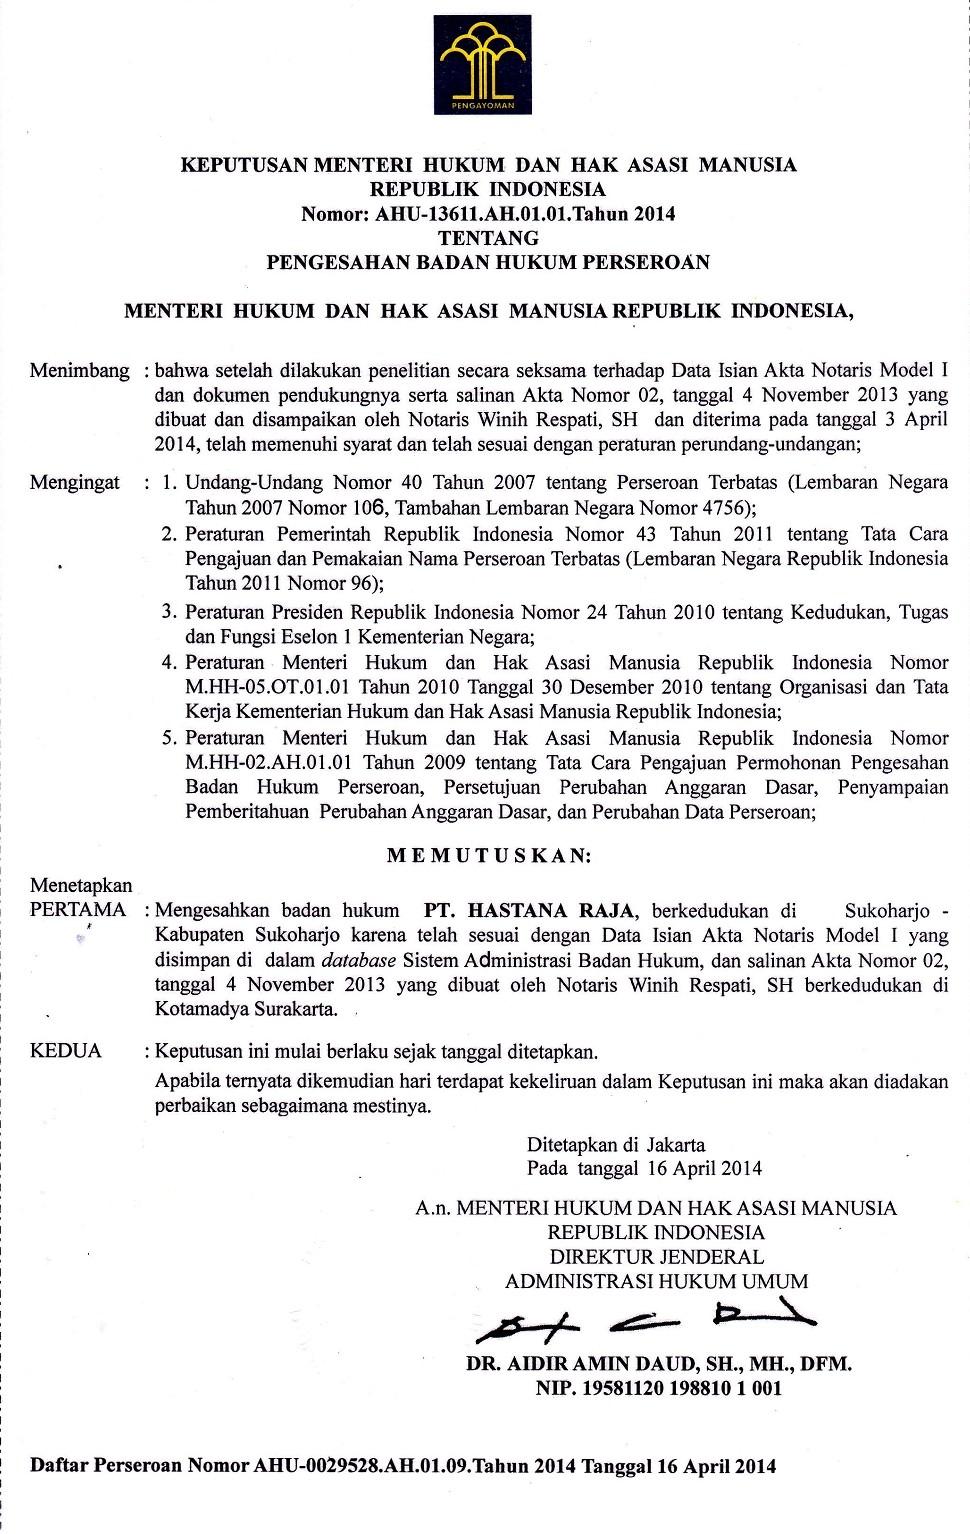 Surat Keputusan Menteri Hukum dan Hak Asasi Manusia